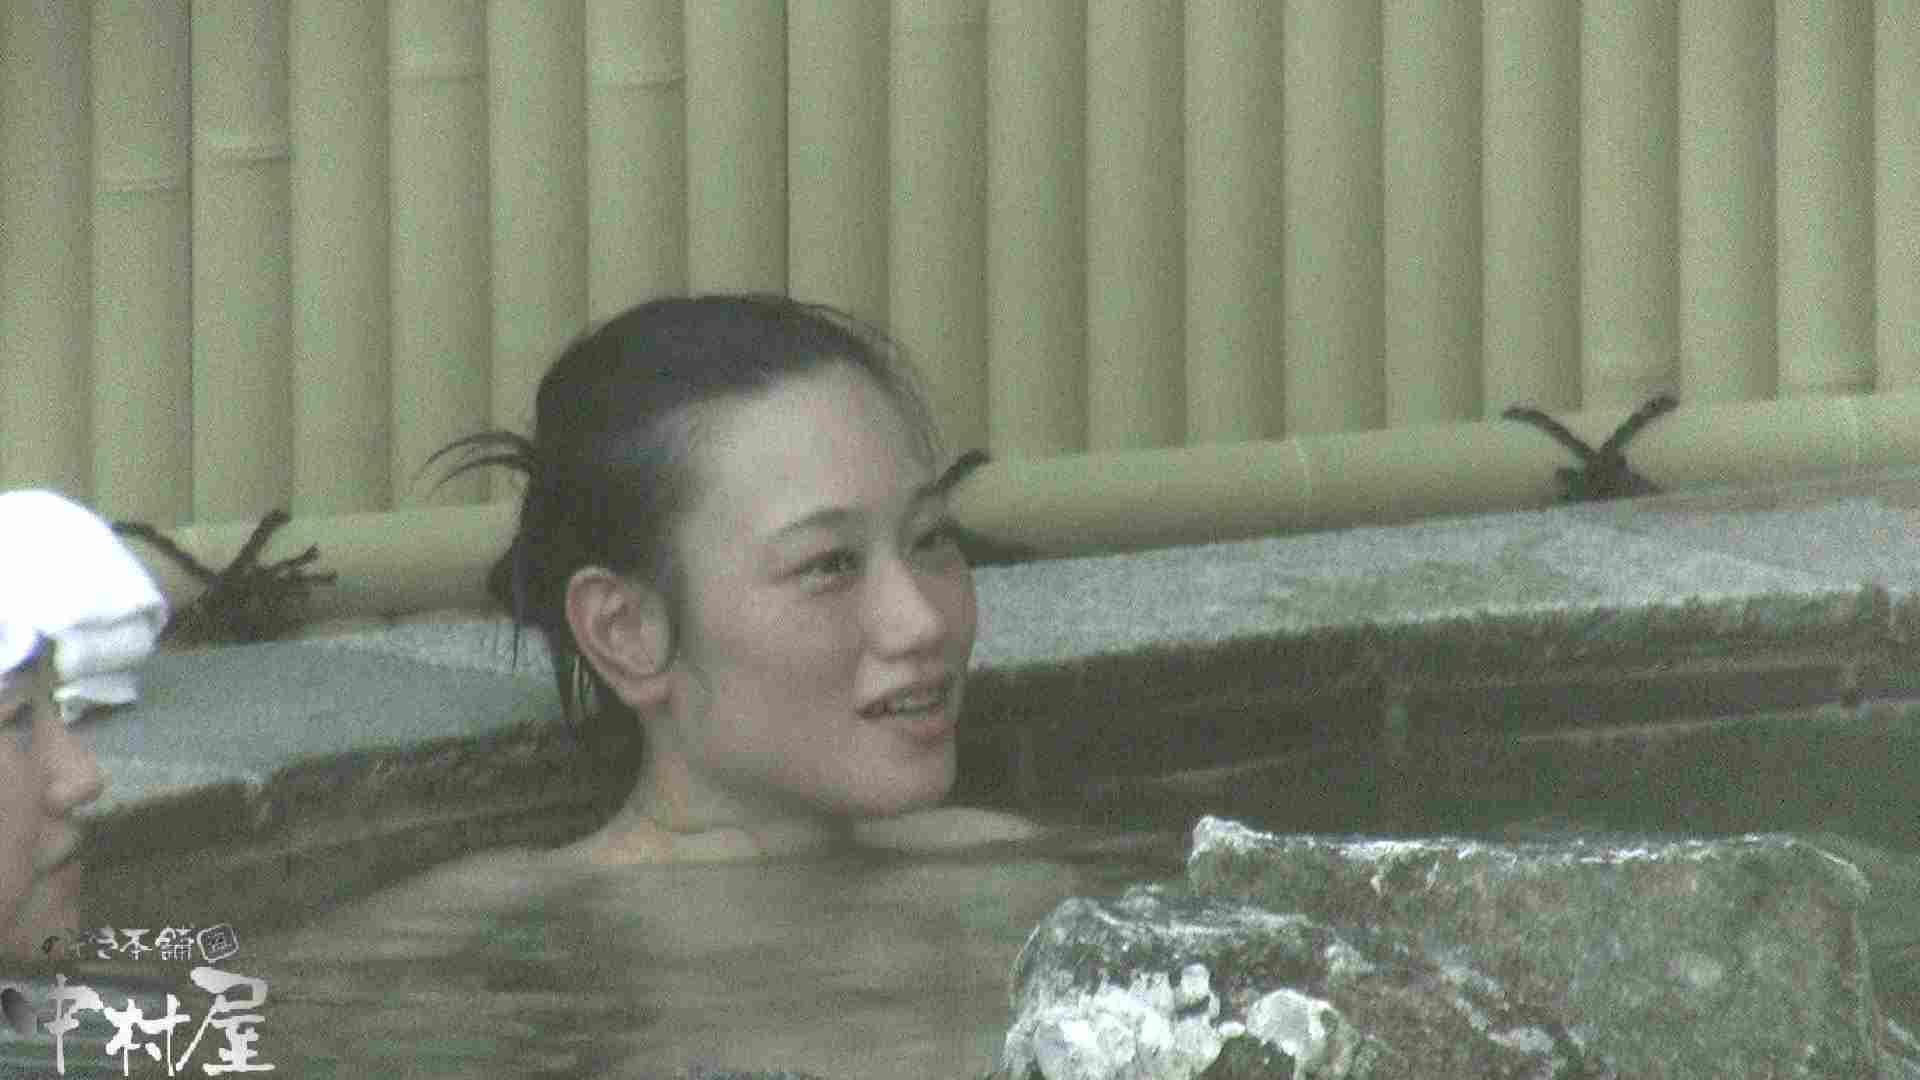 Aquaな露天風呂Vol.914 露天風呂編  83PIX 68